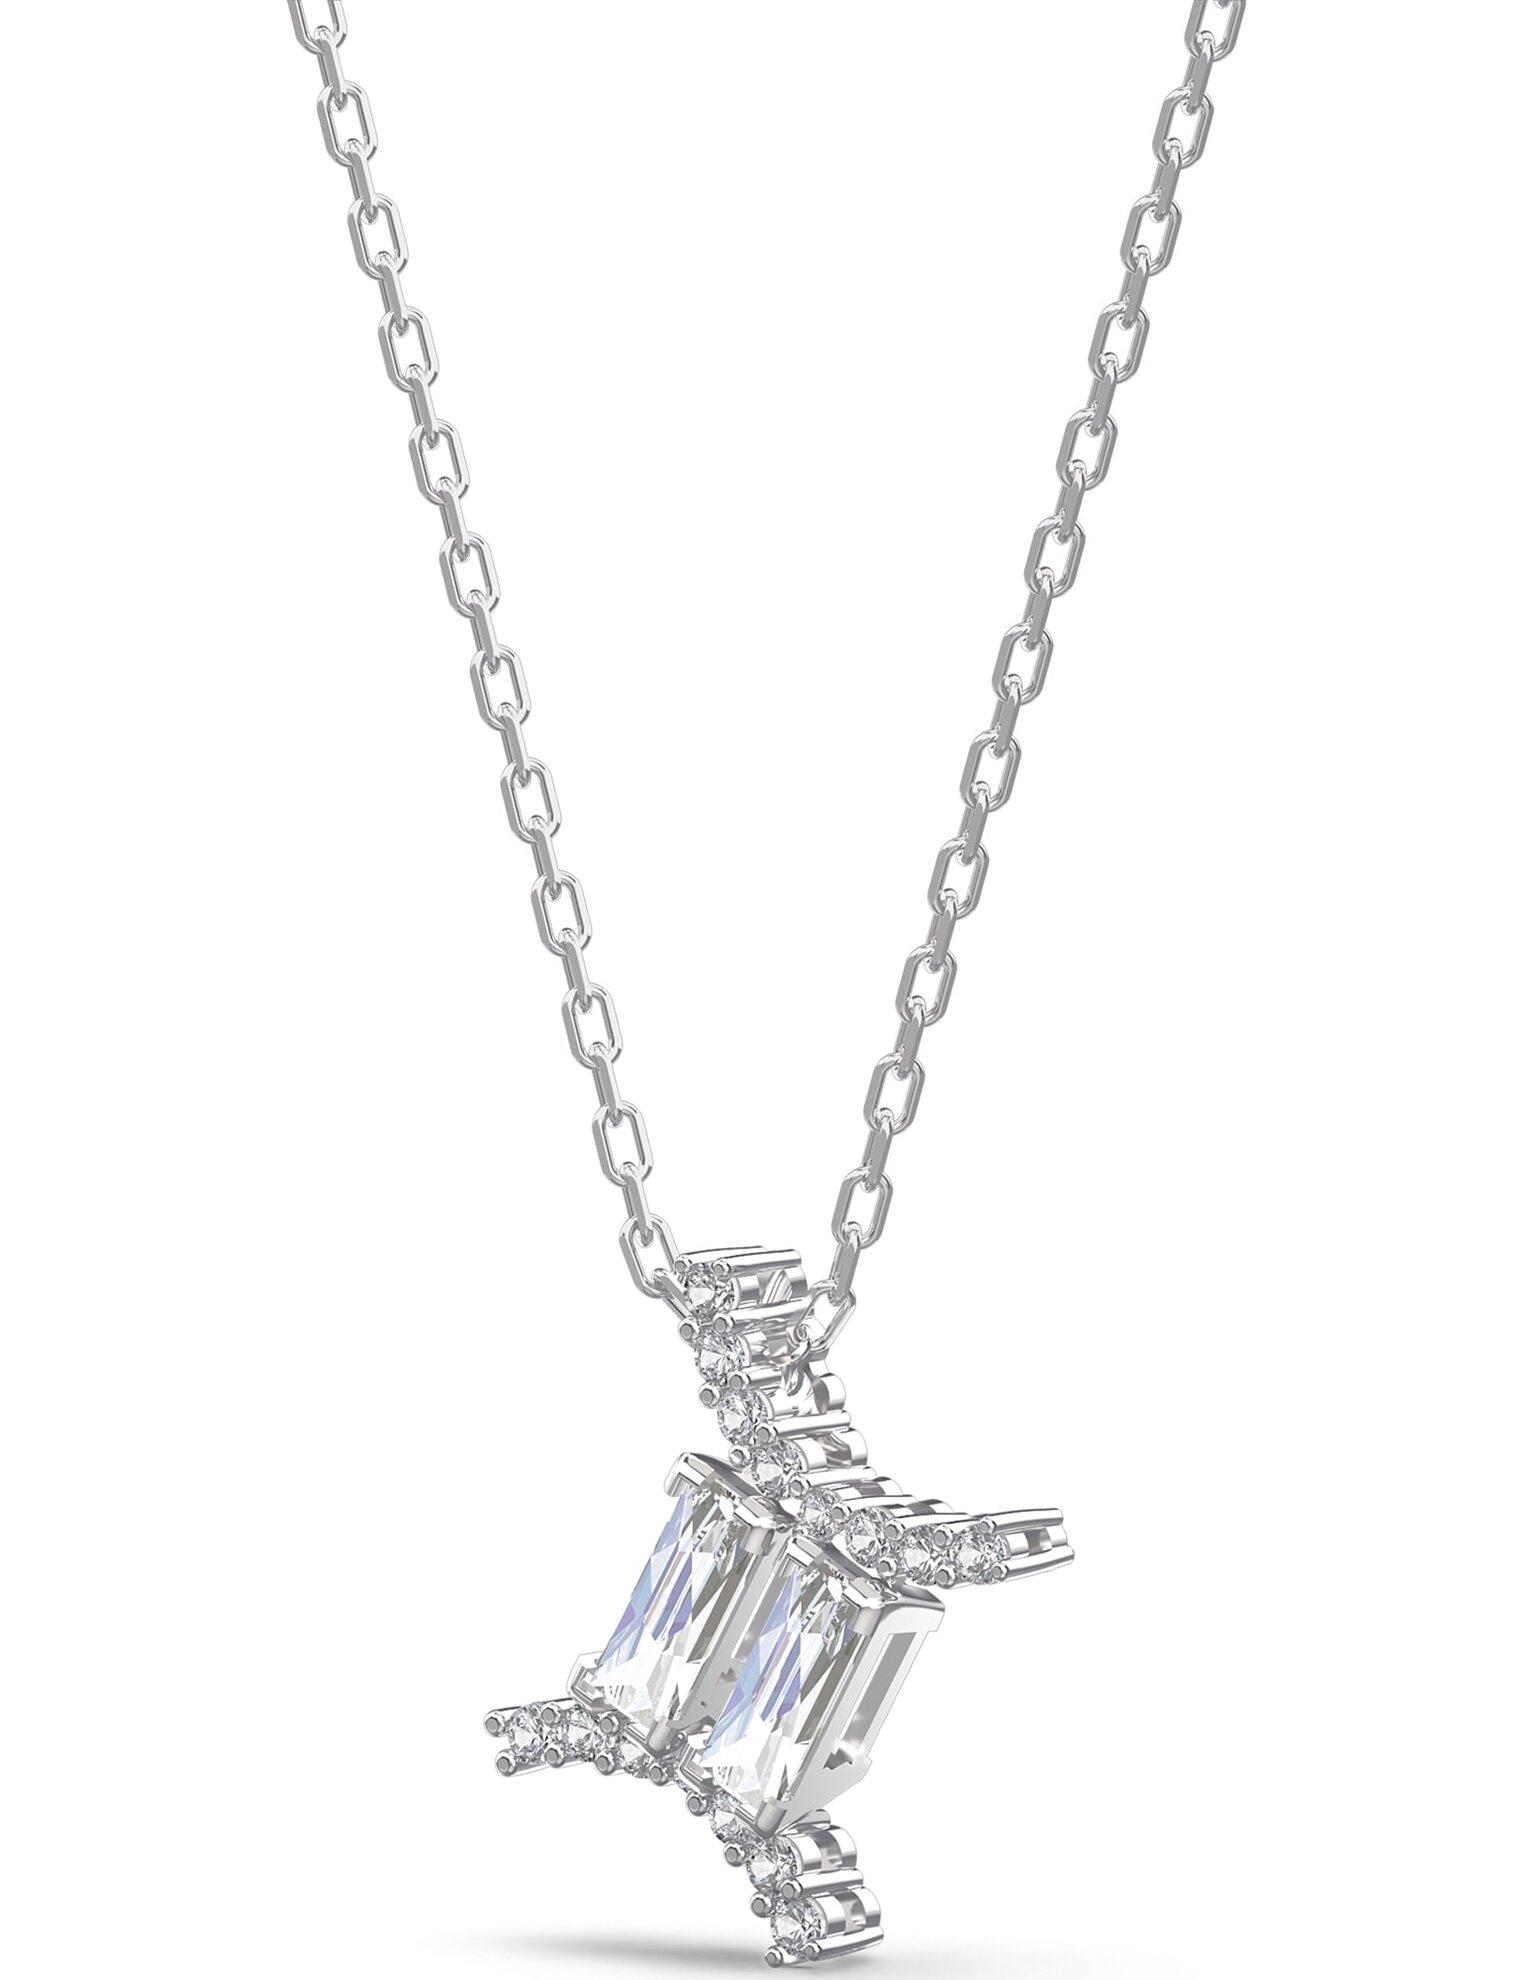 Picture of Zodiac II kolye, İkizler, Beyaz, Karışık metal